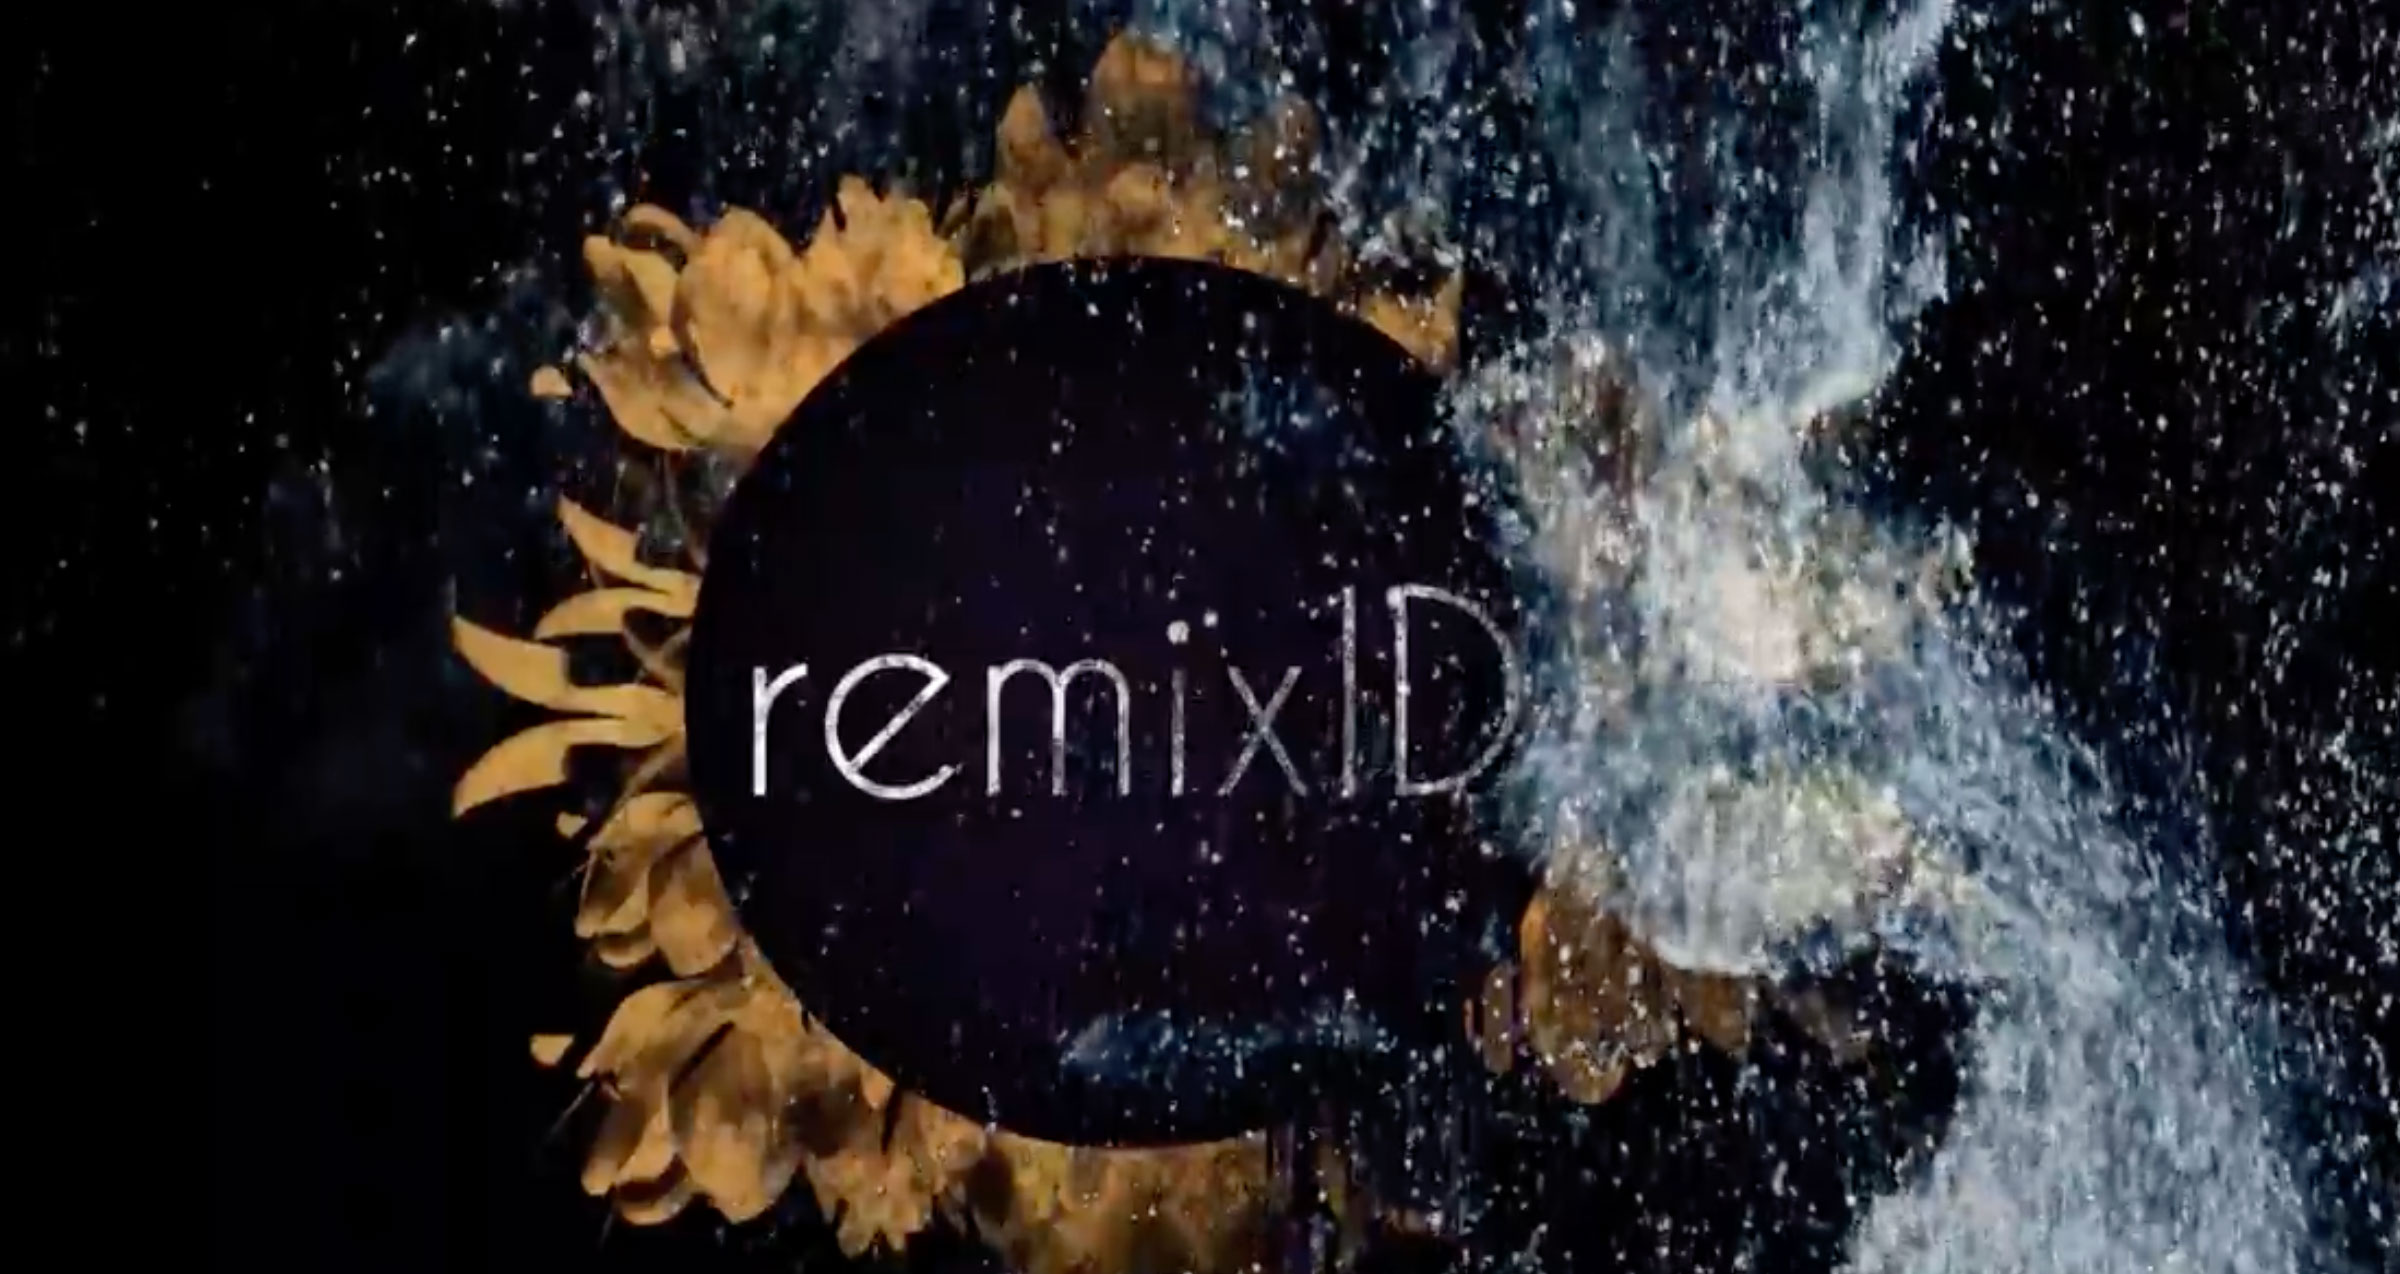 remixid